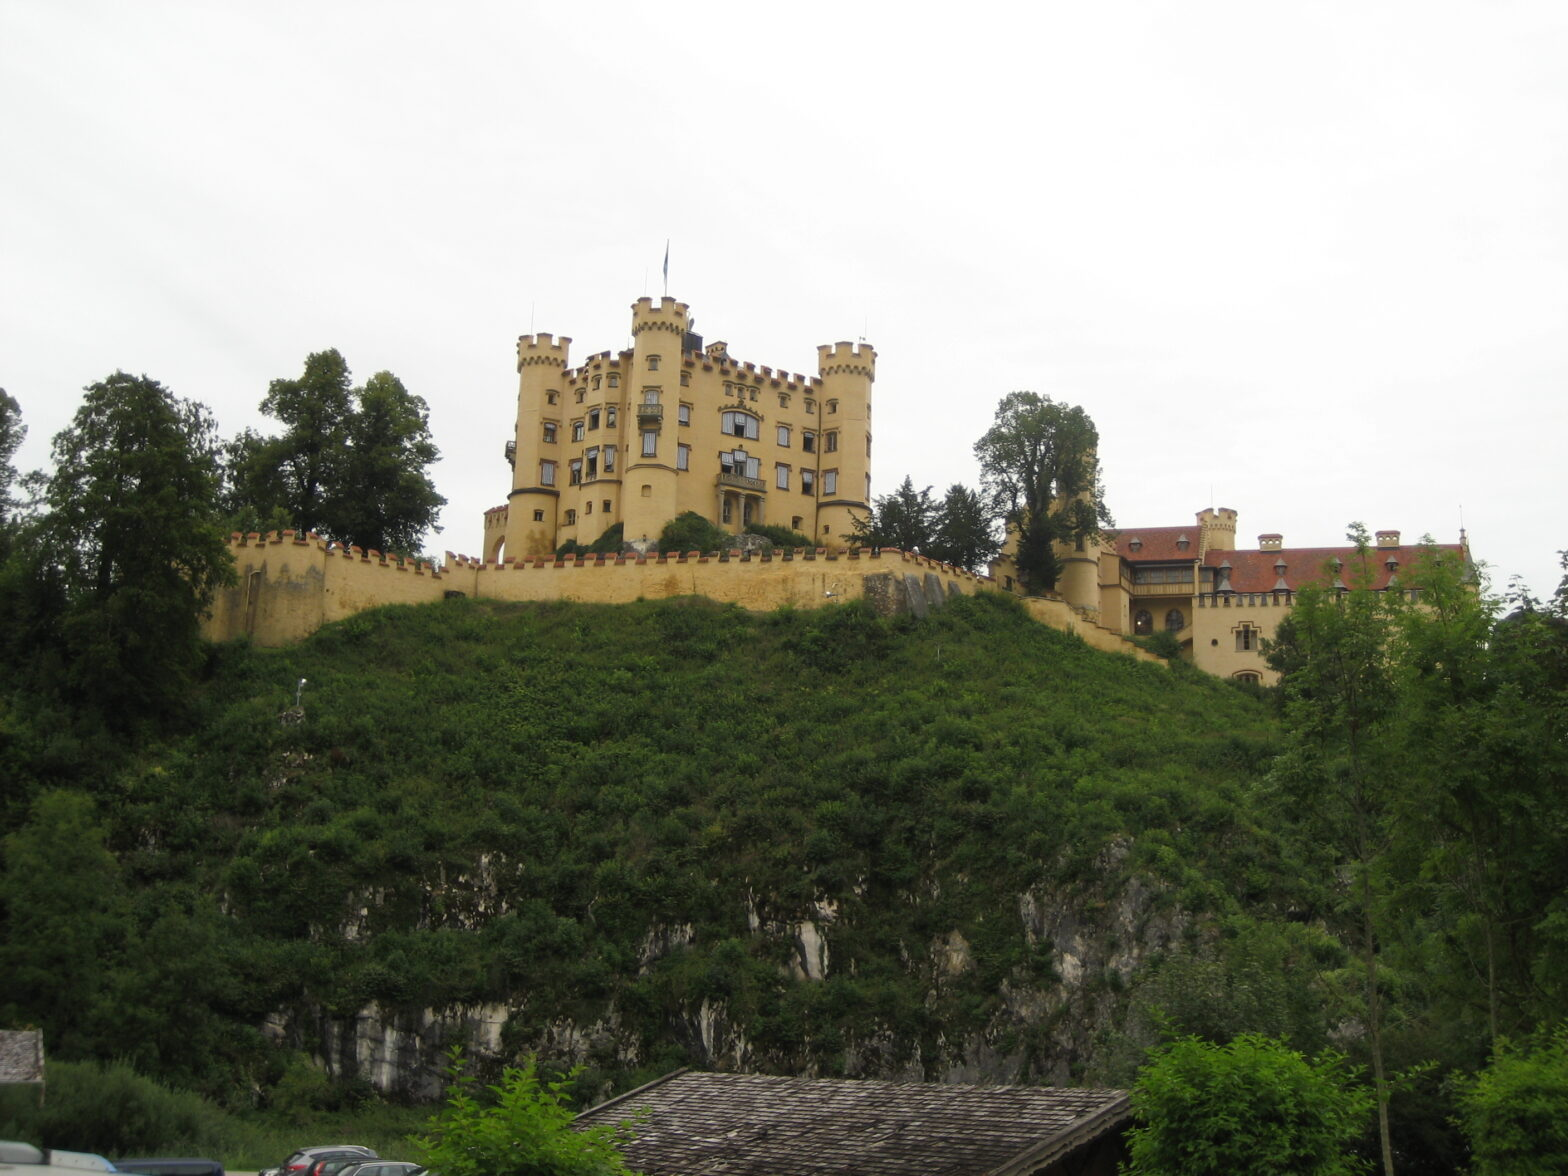 Tag 1 - Schlosstour